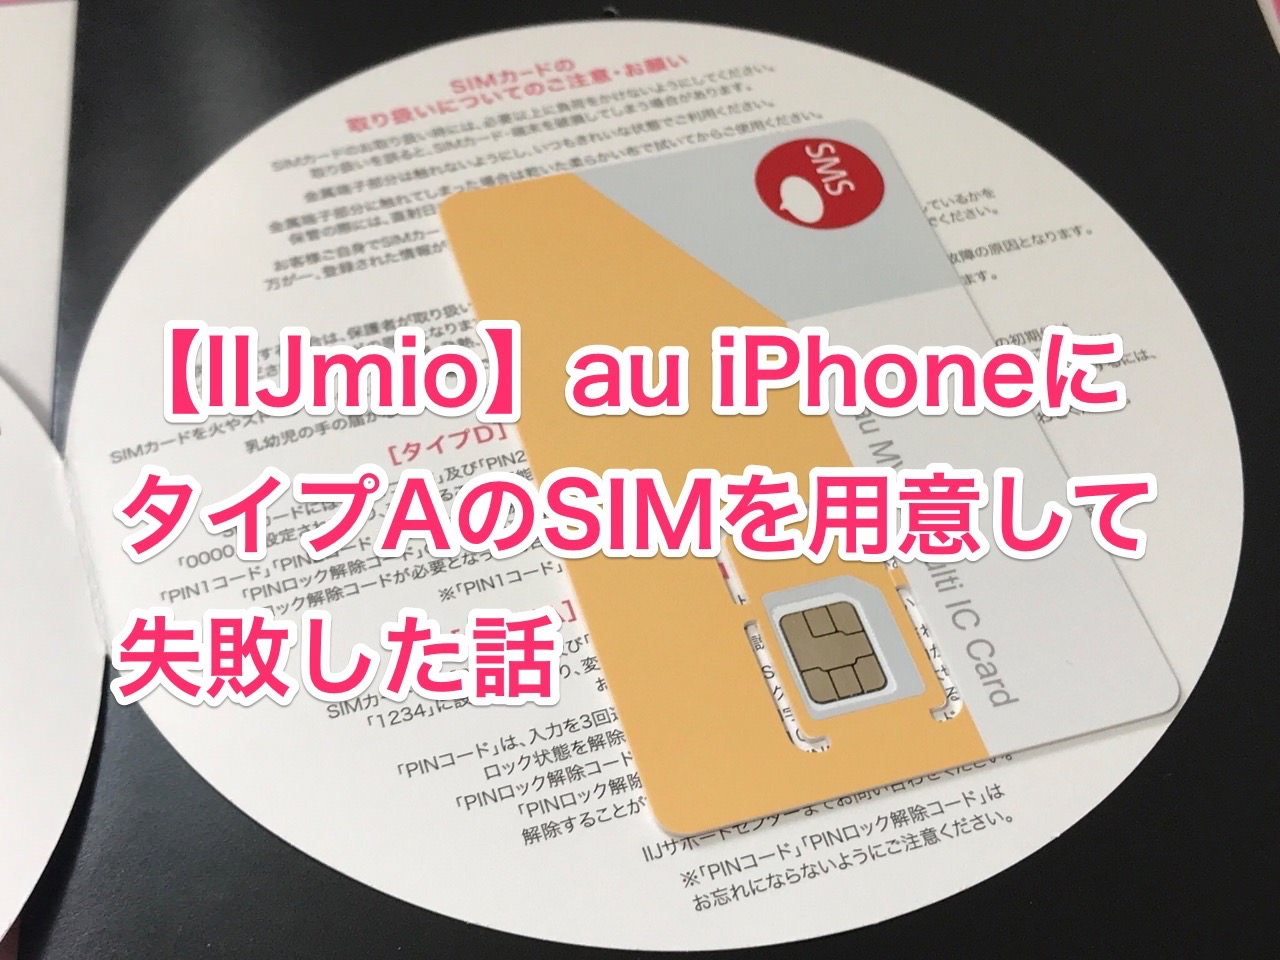 【IIJmio】au iPhoneにタイプAのSIMを用意して失敗した話